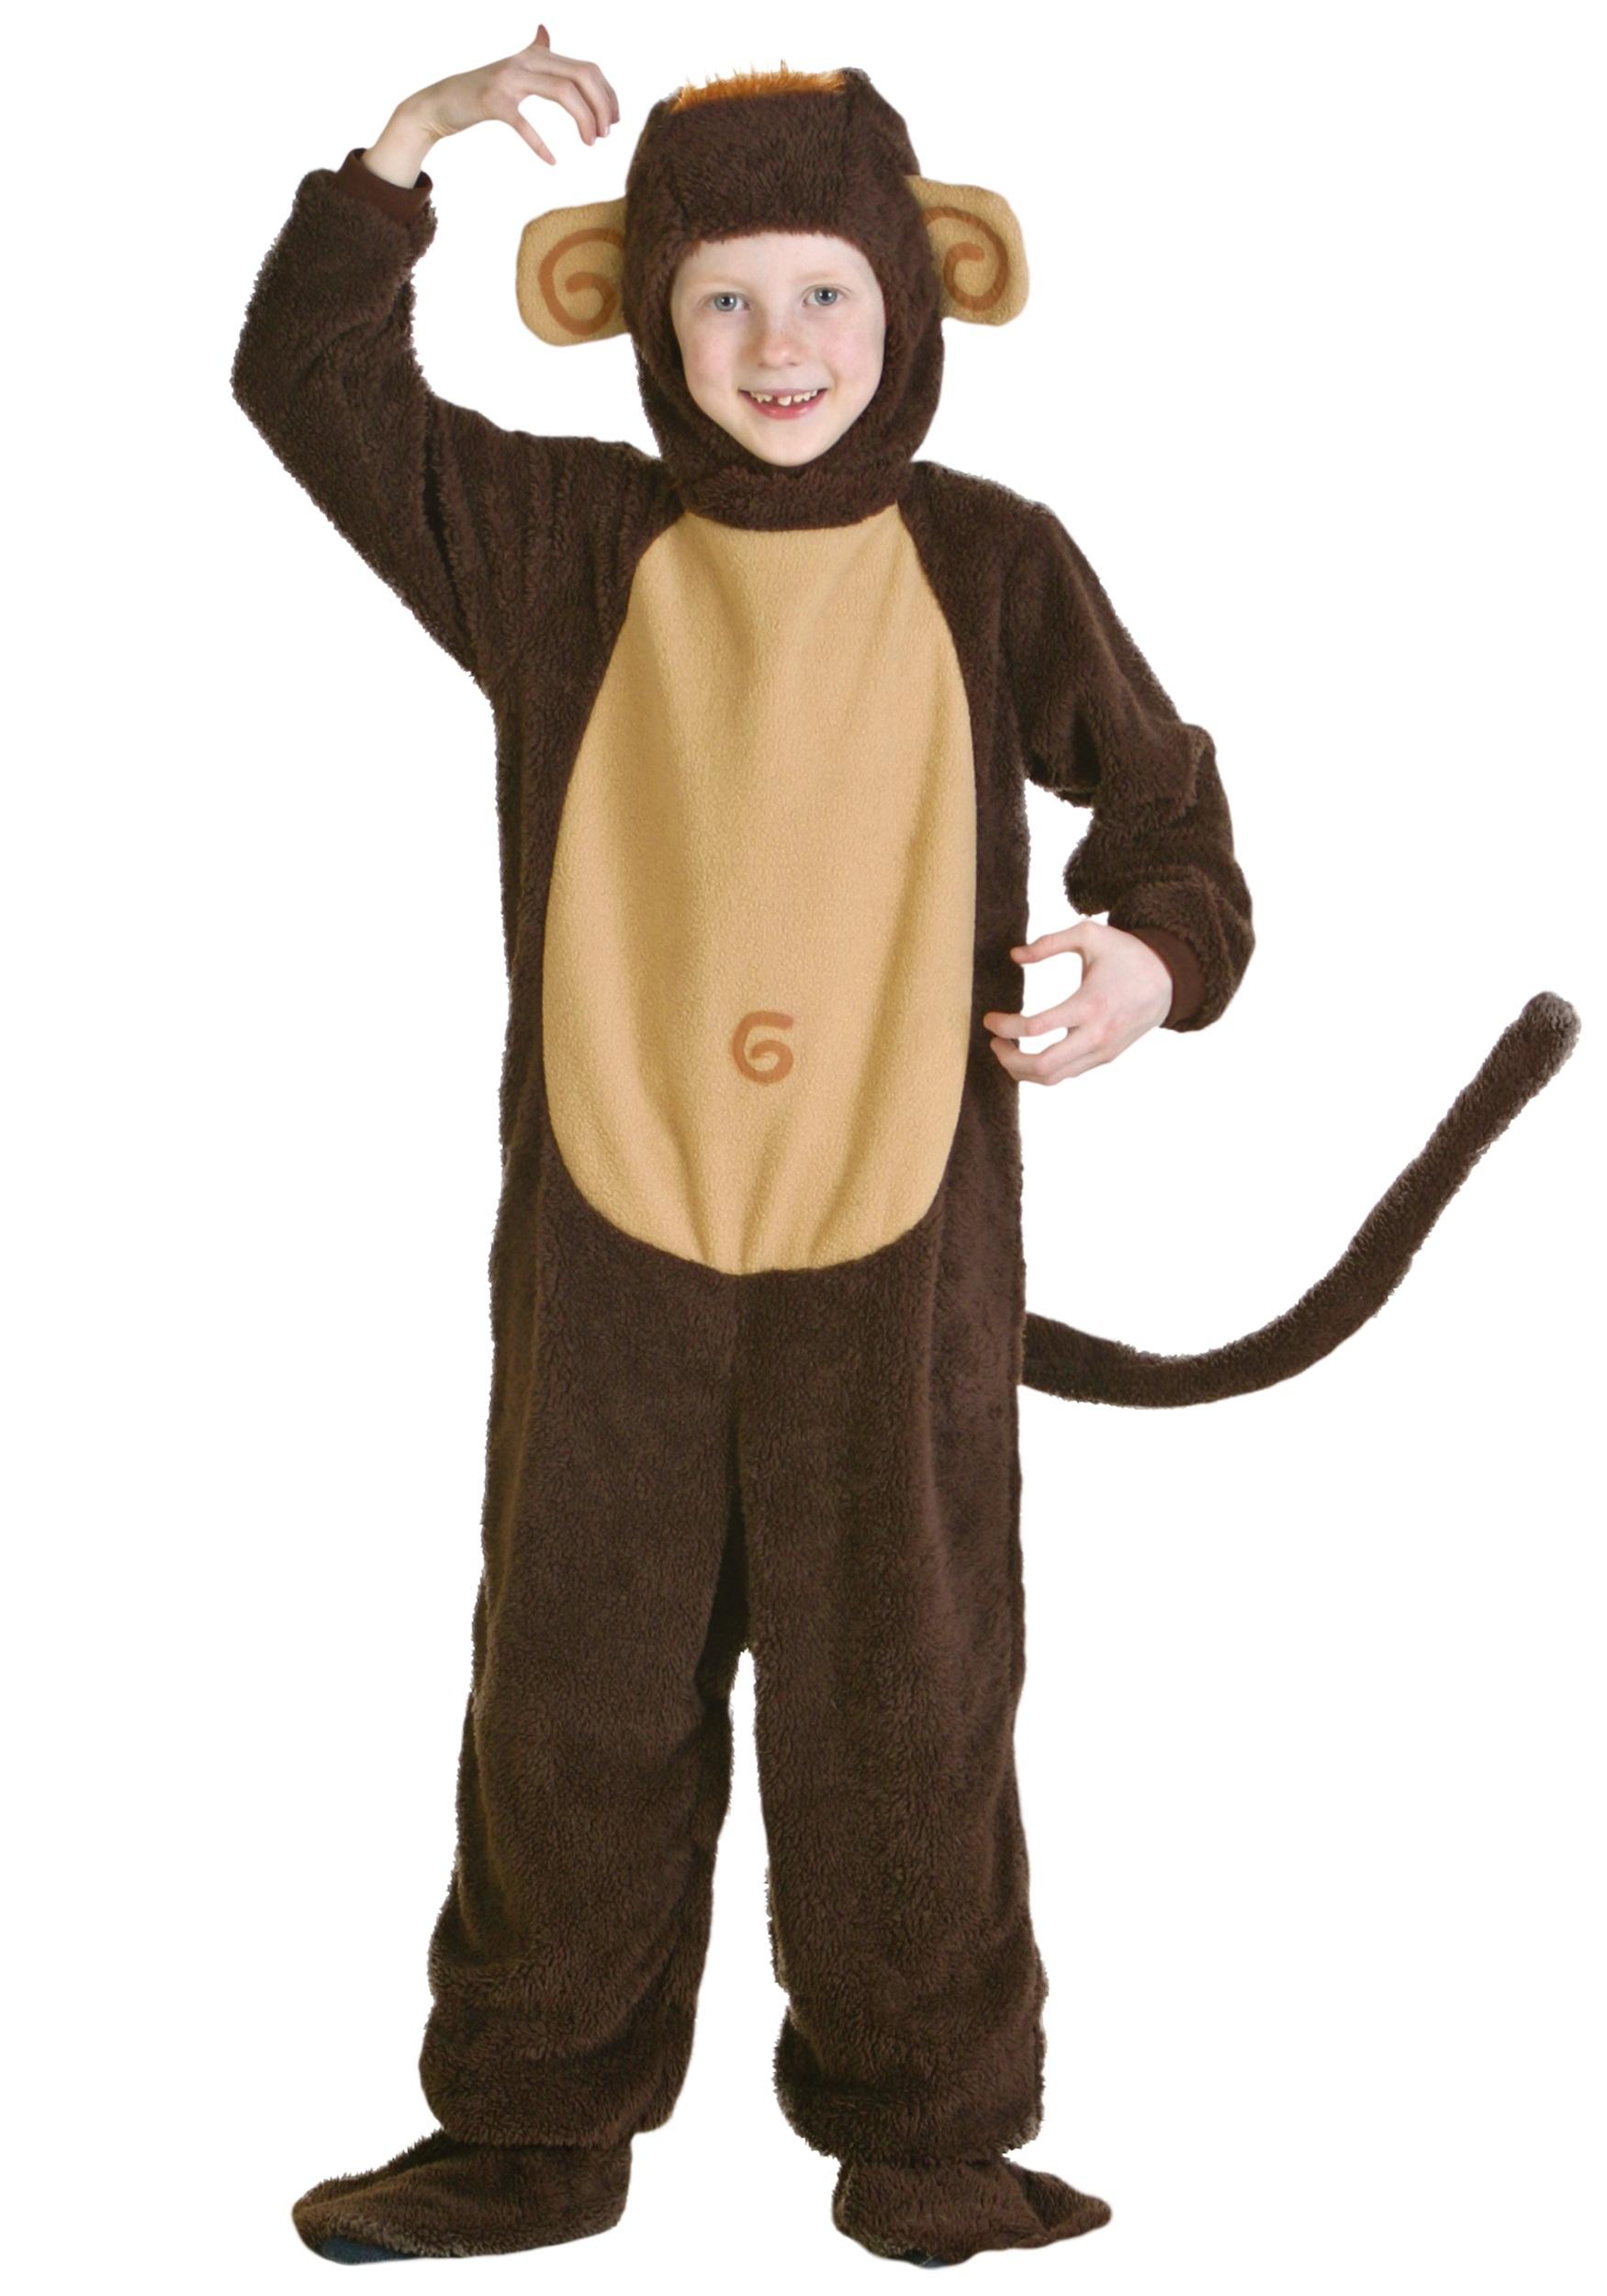 Cheeky Monkey Costume  sc 1 st  Halloween Costume & Cheeky Monkey Costume - Child Animal Costumes